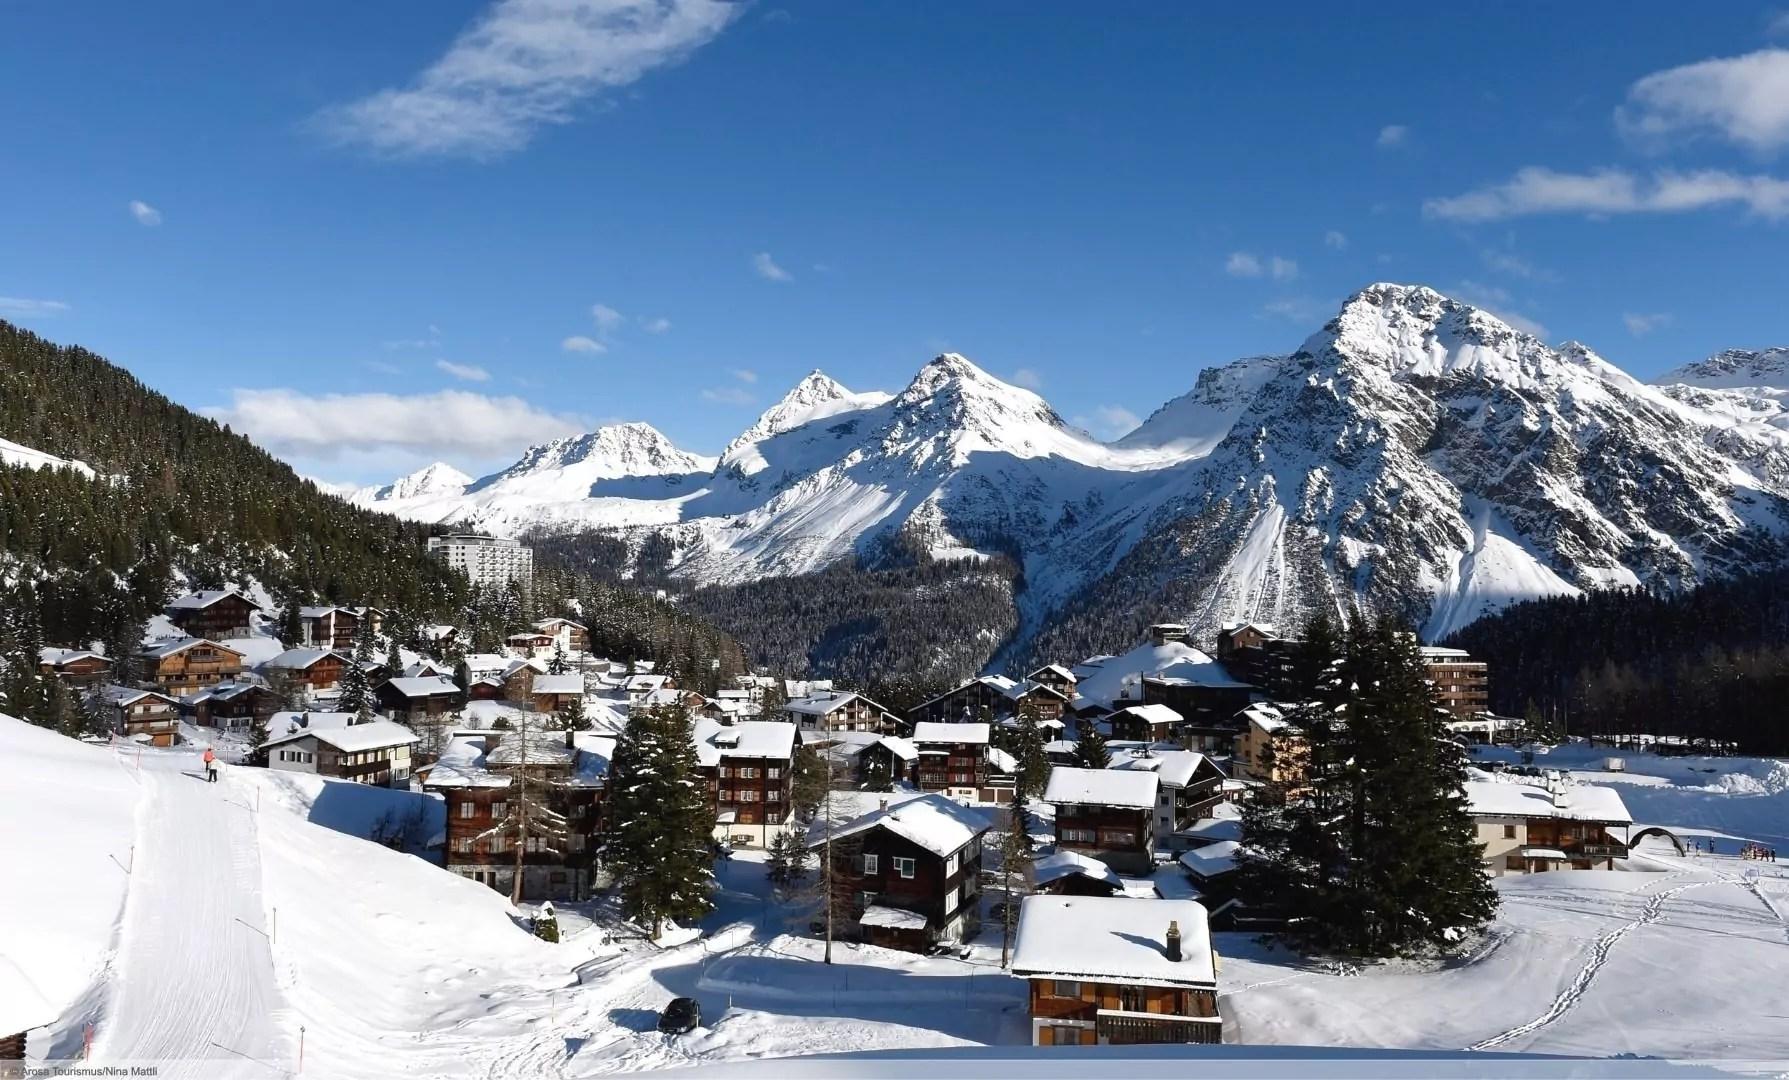 wintersport en aanbiedingen in Arosa